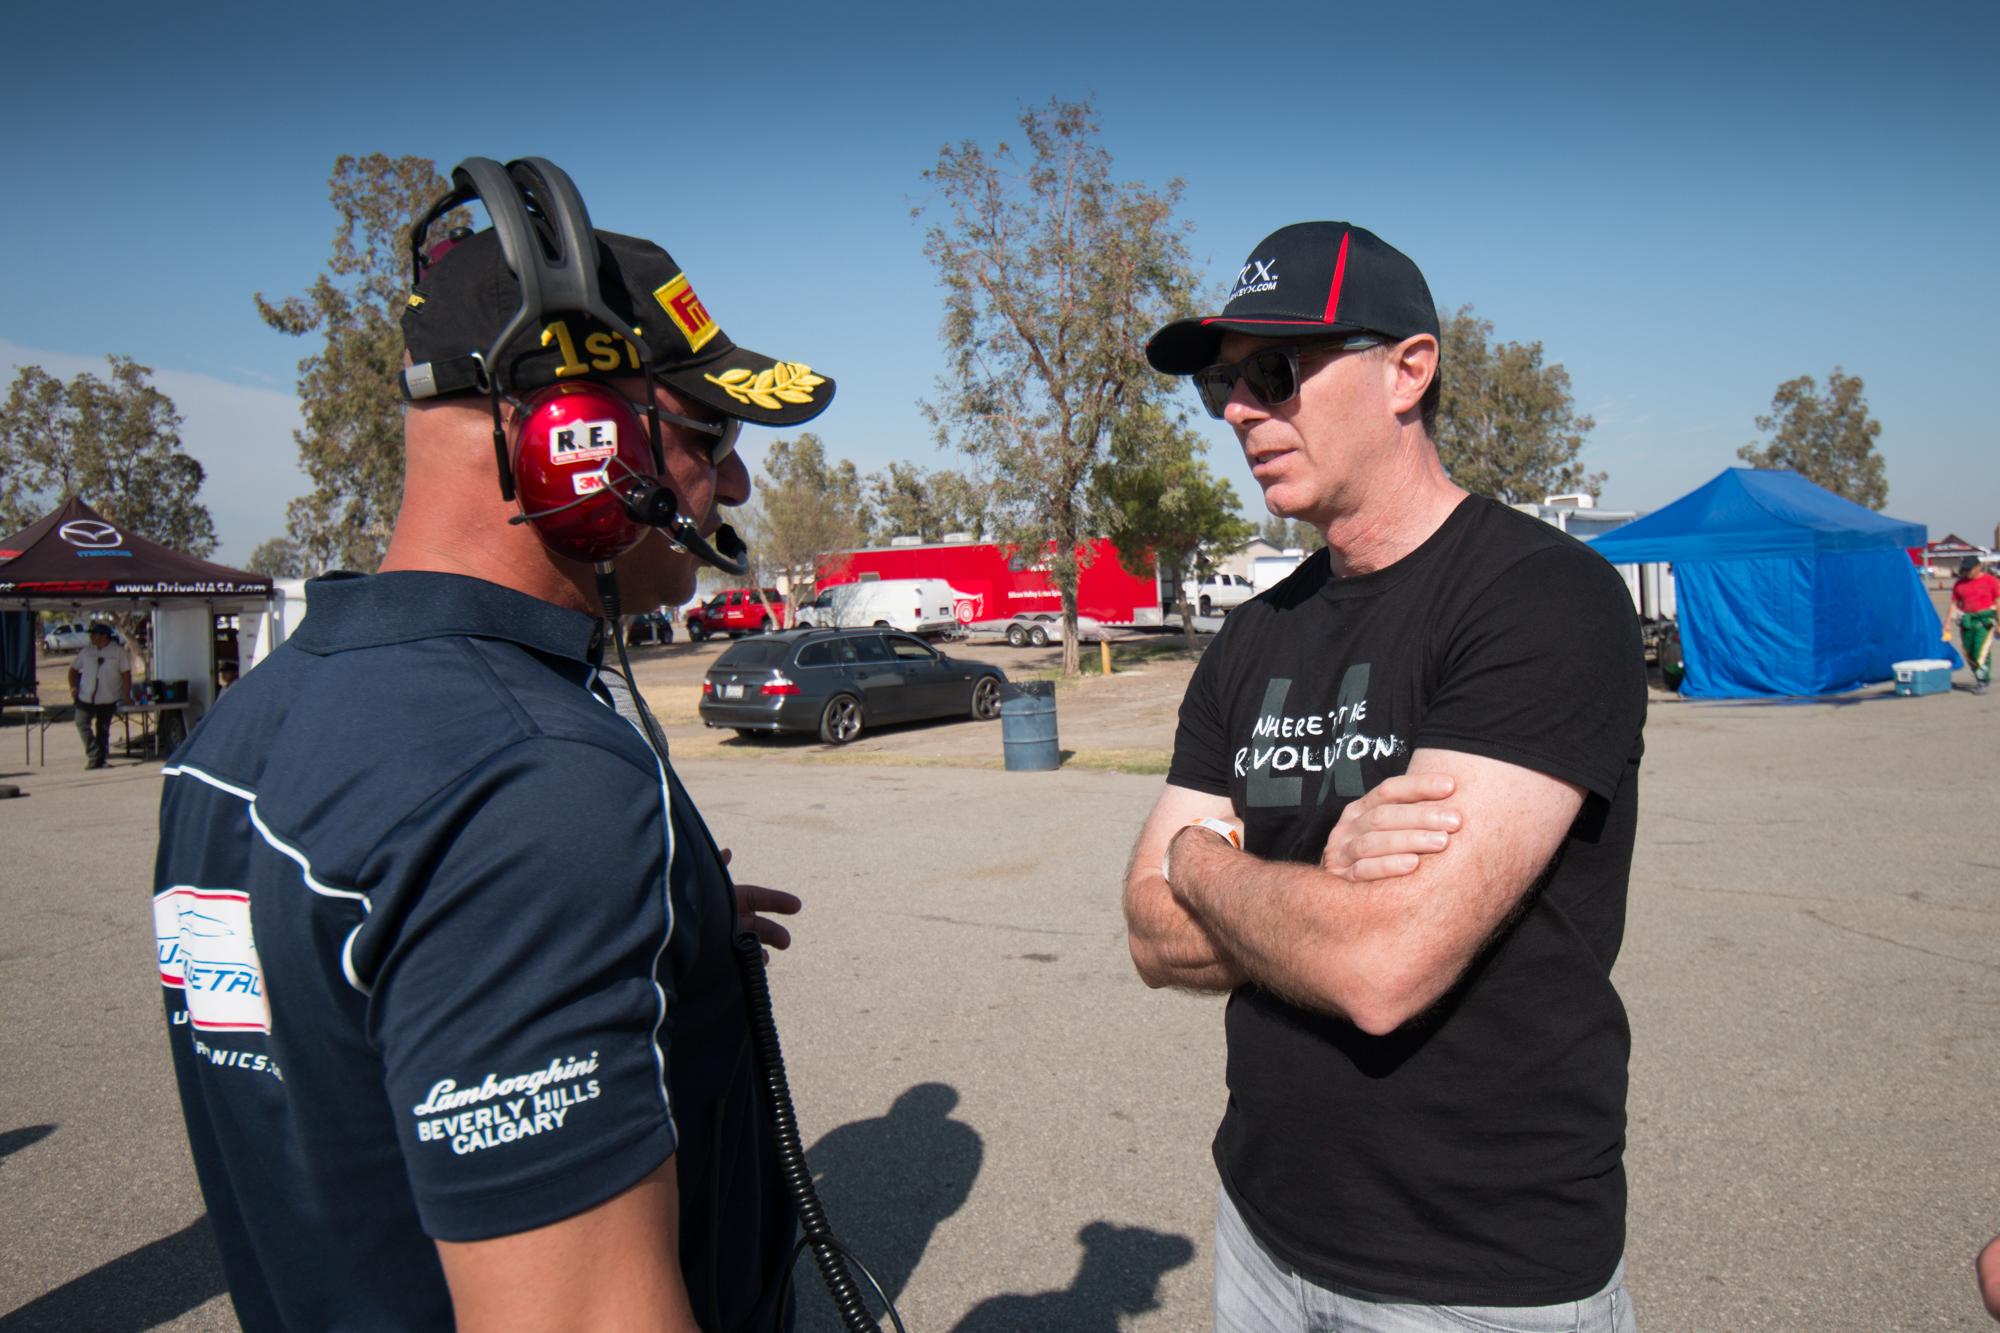 Steven-Racing-20130228-55418.jpg